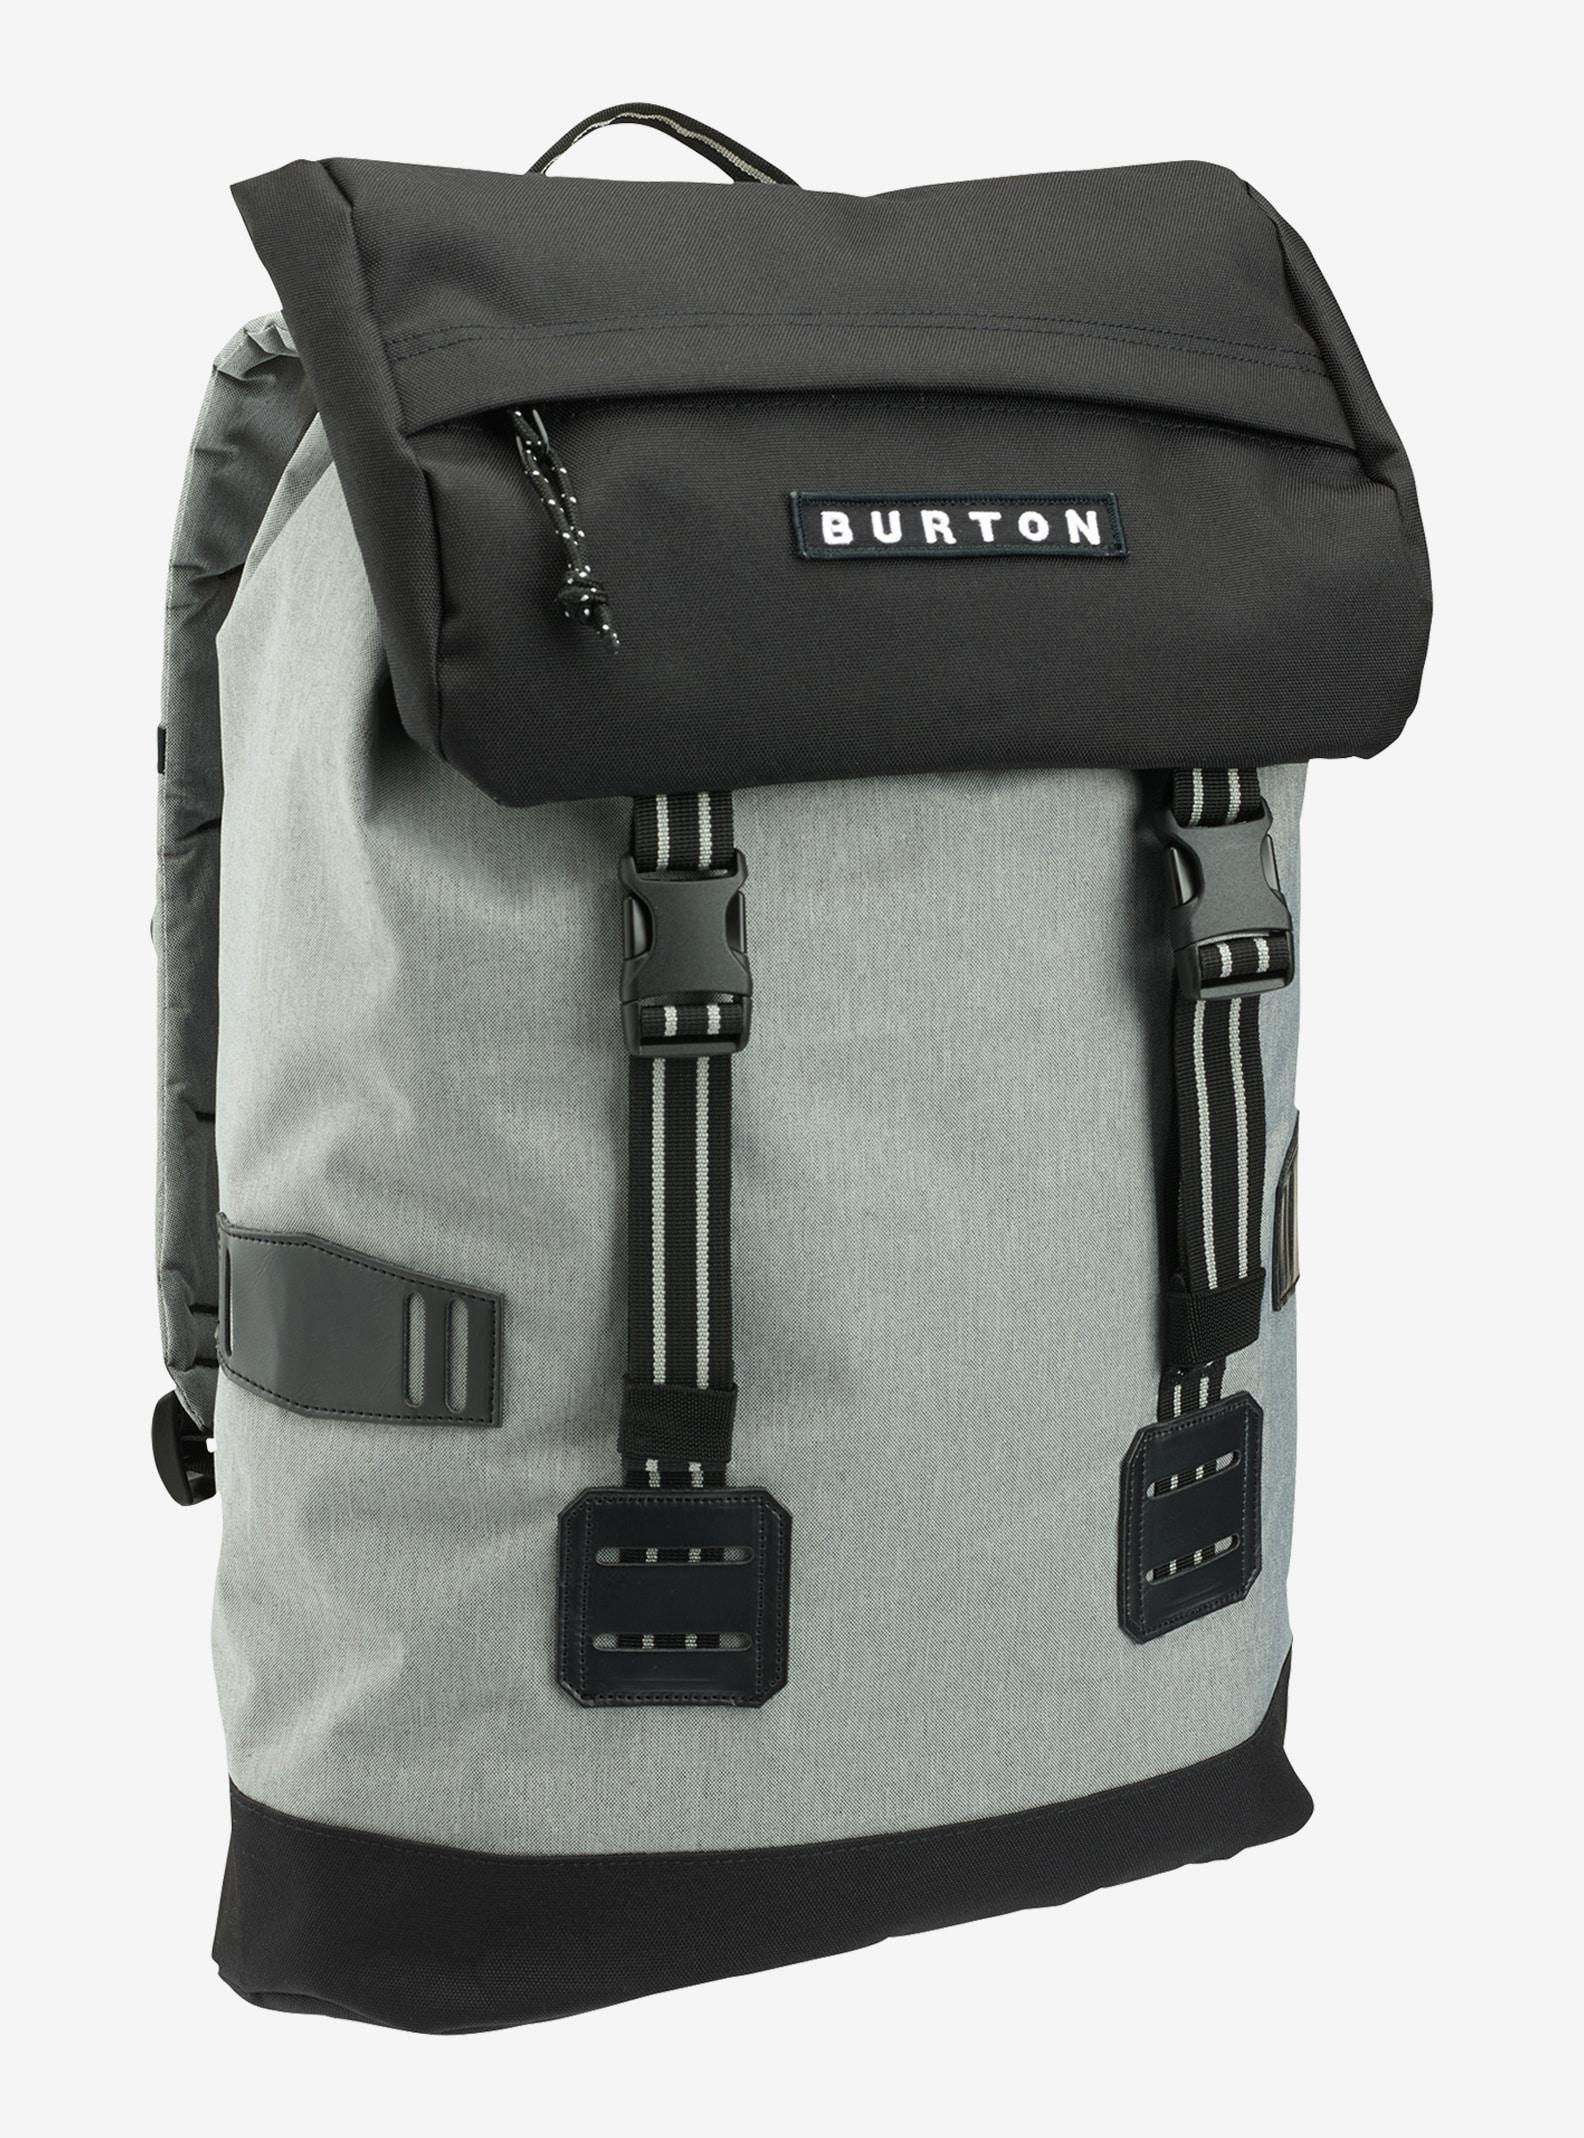 Burton Tinder Backpack shown in Grey Heather